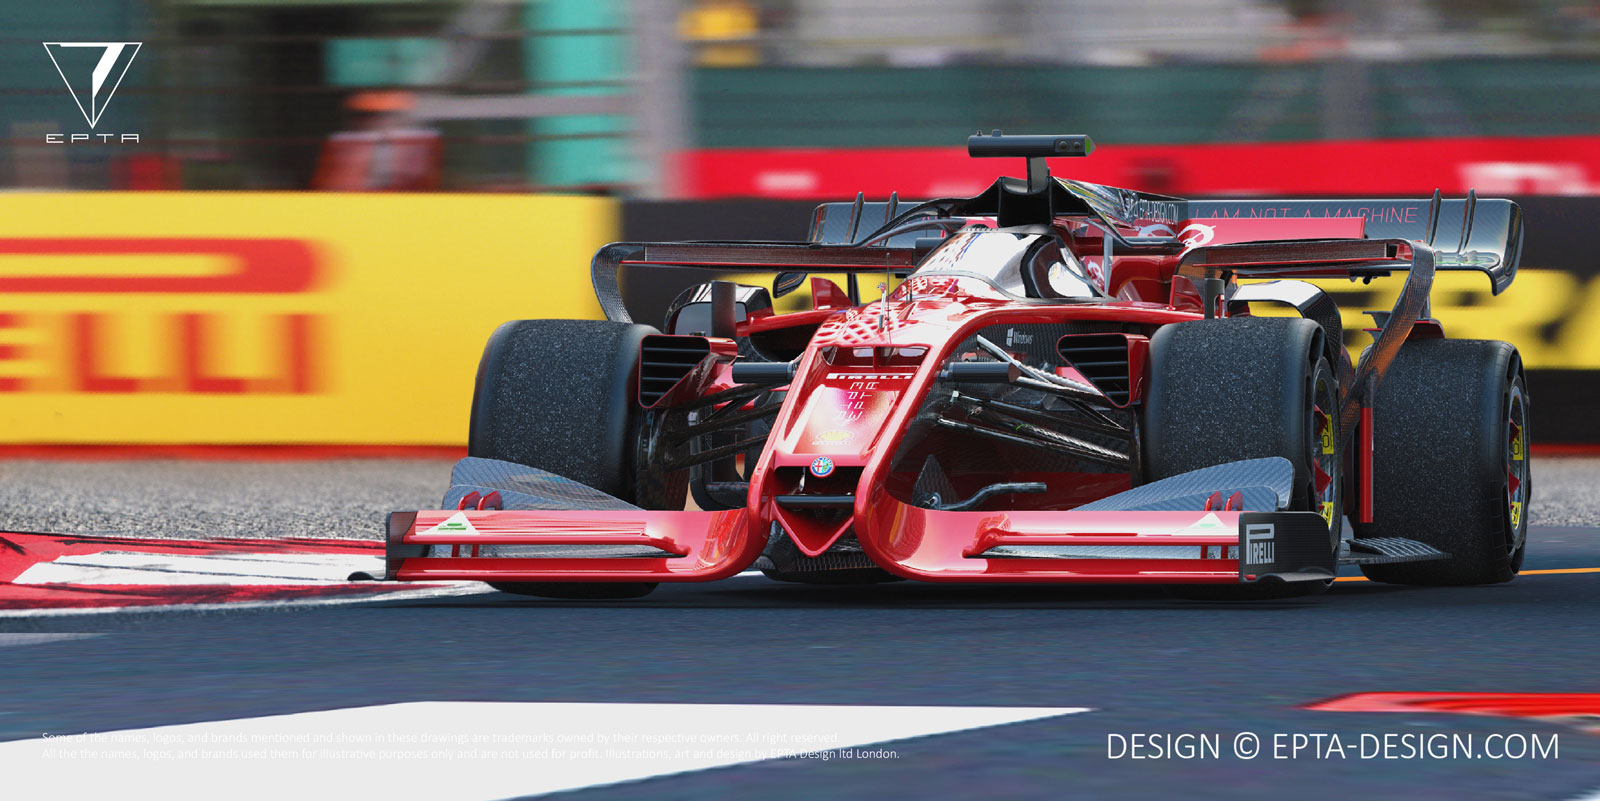 Swedish Race Car